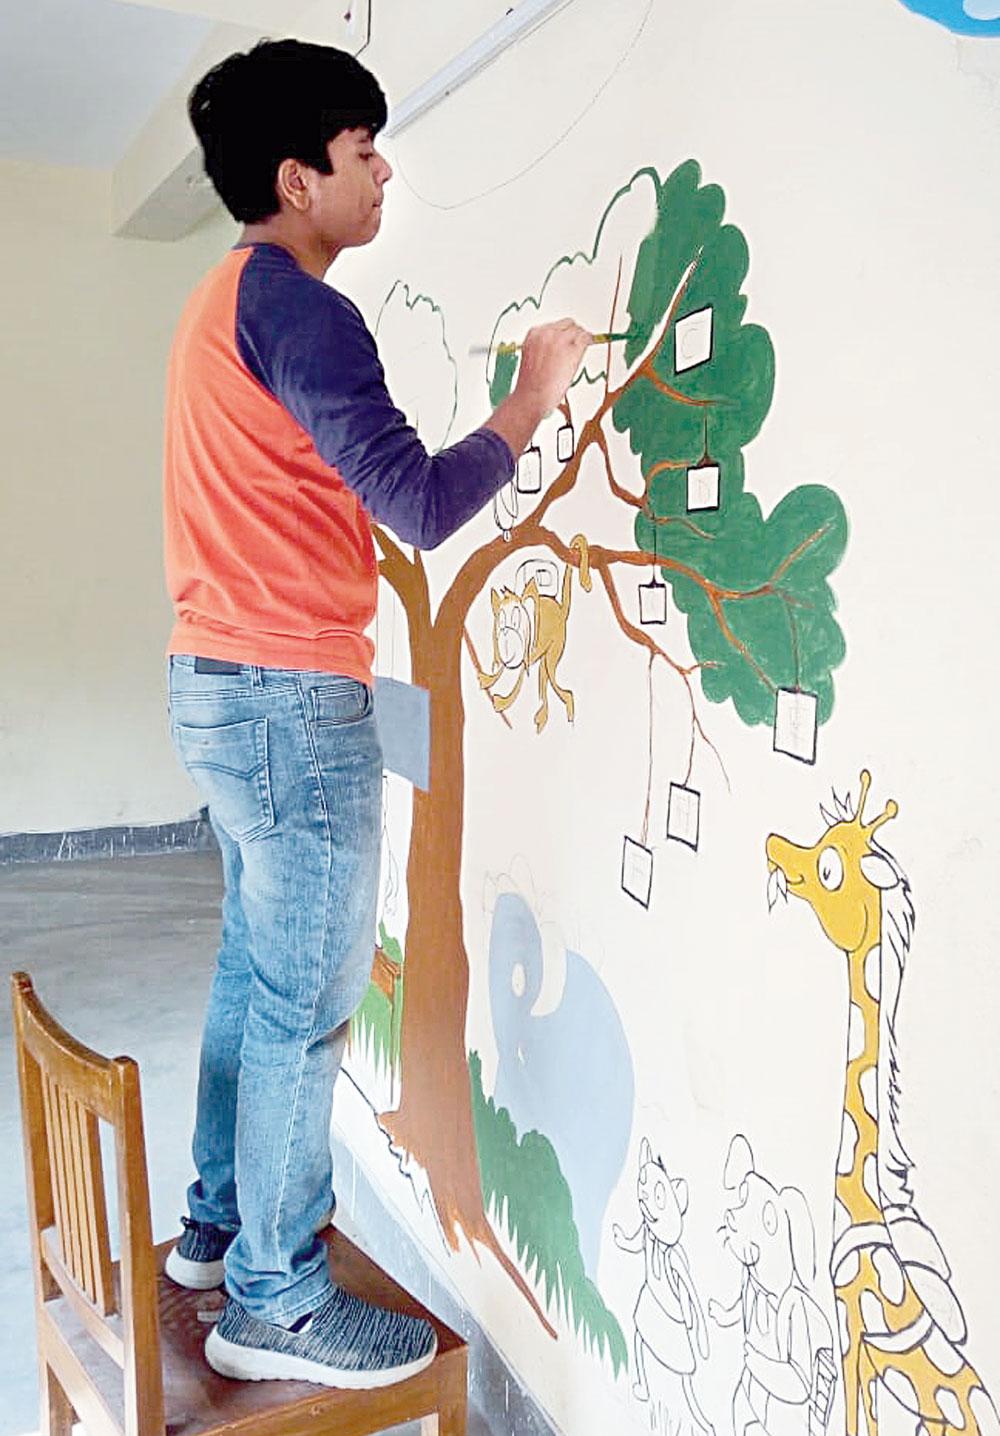 Harshit Jain paints a wall of Nandipur Swami Vivekananda Vidyamandir, a school in Dum Dum Park run by a fish seller